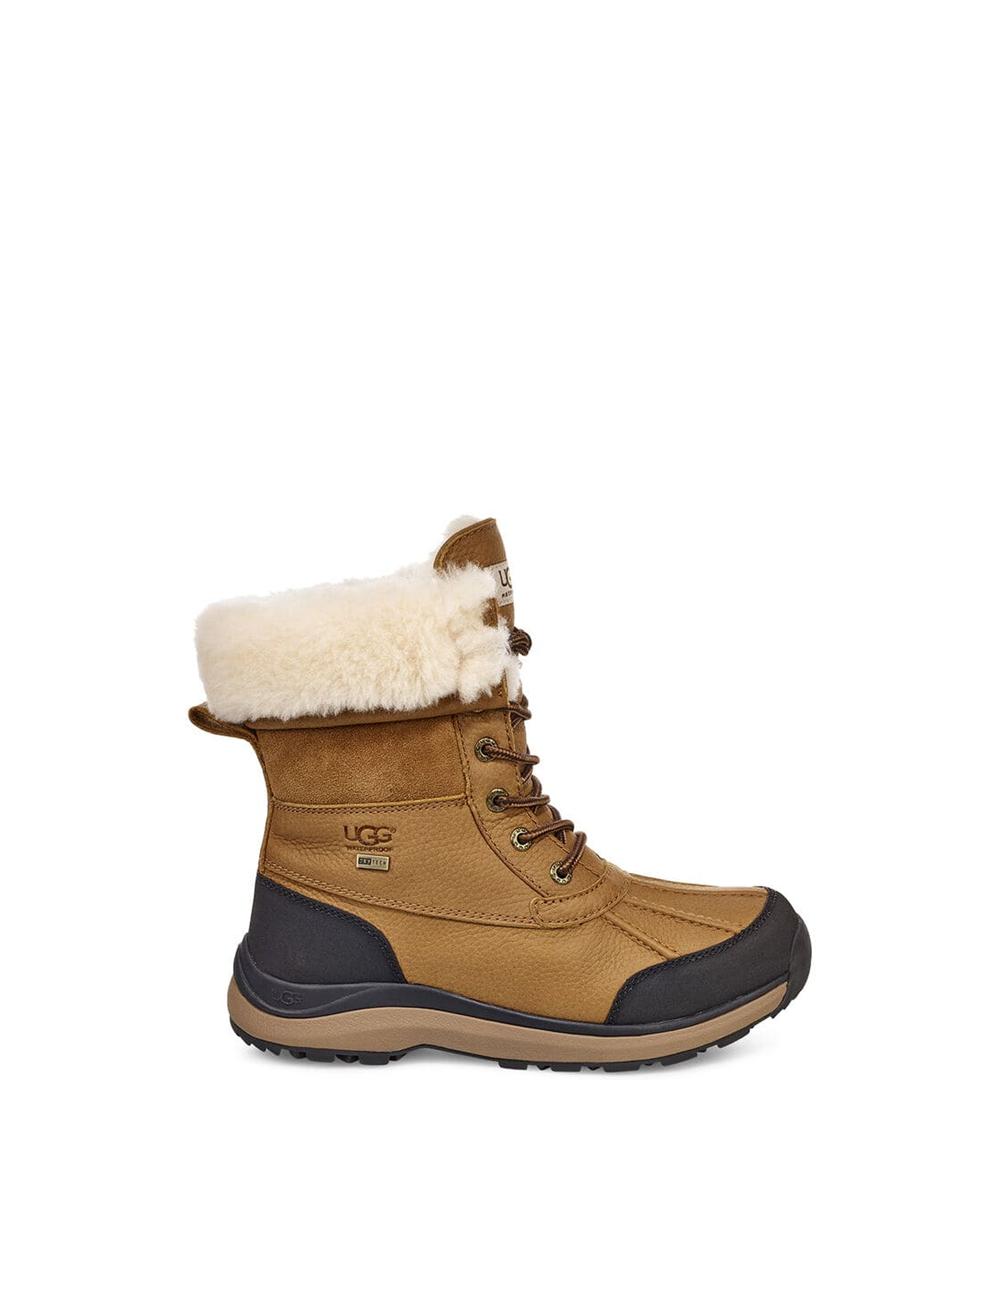 Boots Adirondack UGG - BIG BOSS MEGEVE